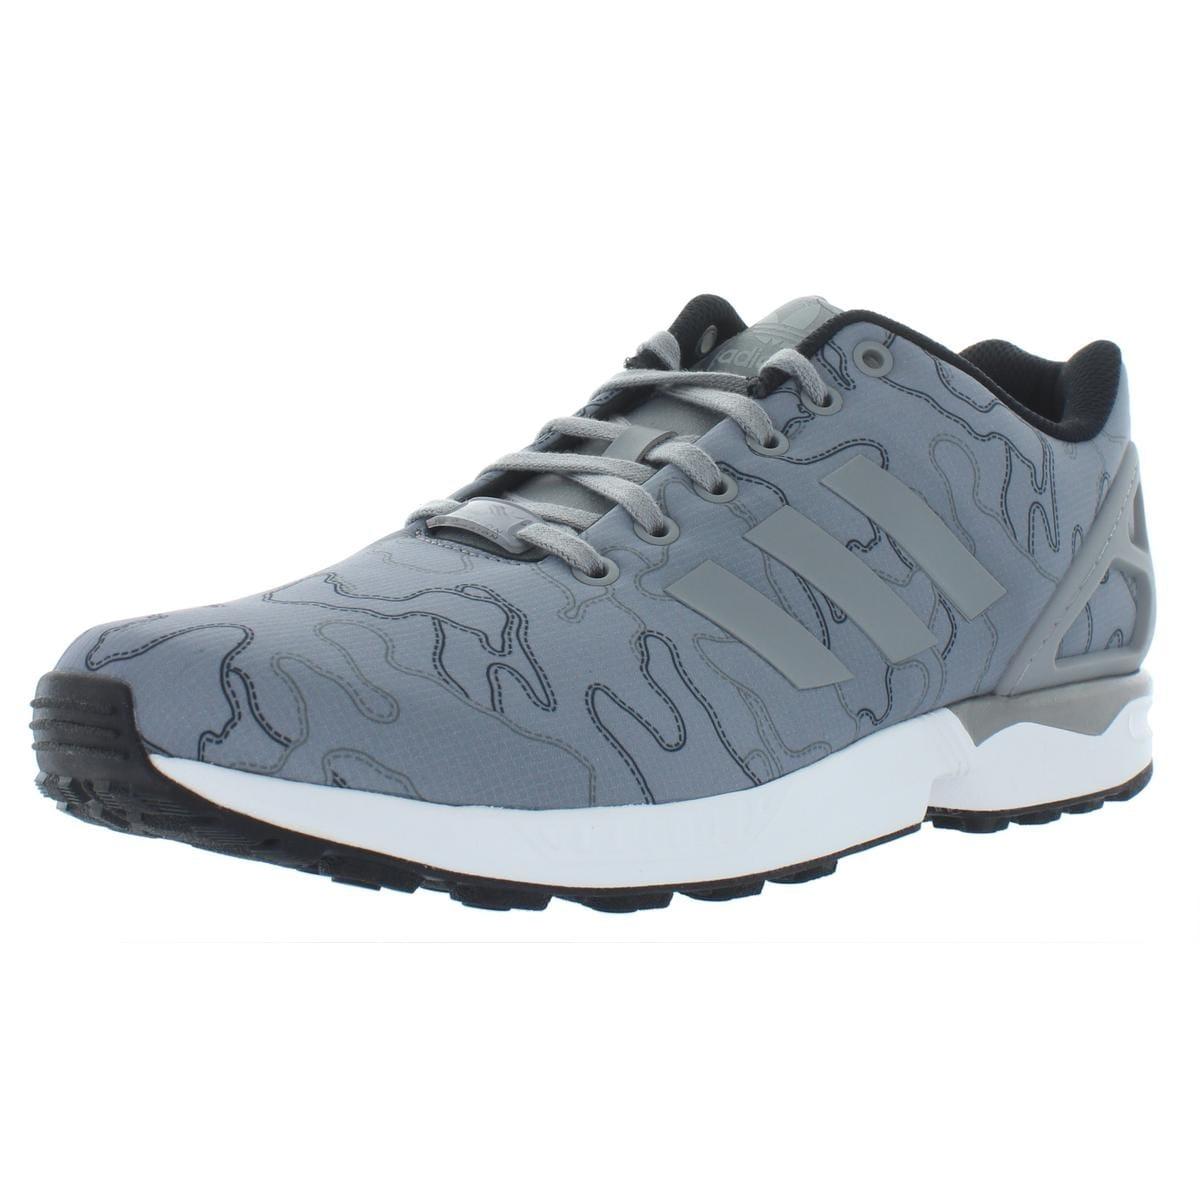 huge selection of 22280 f2916 adidas Originals Mens ZX Flux Running Shoes Low Top Active